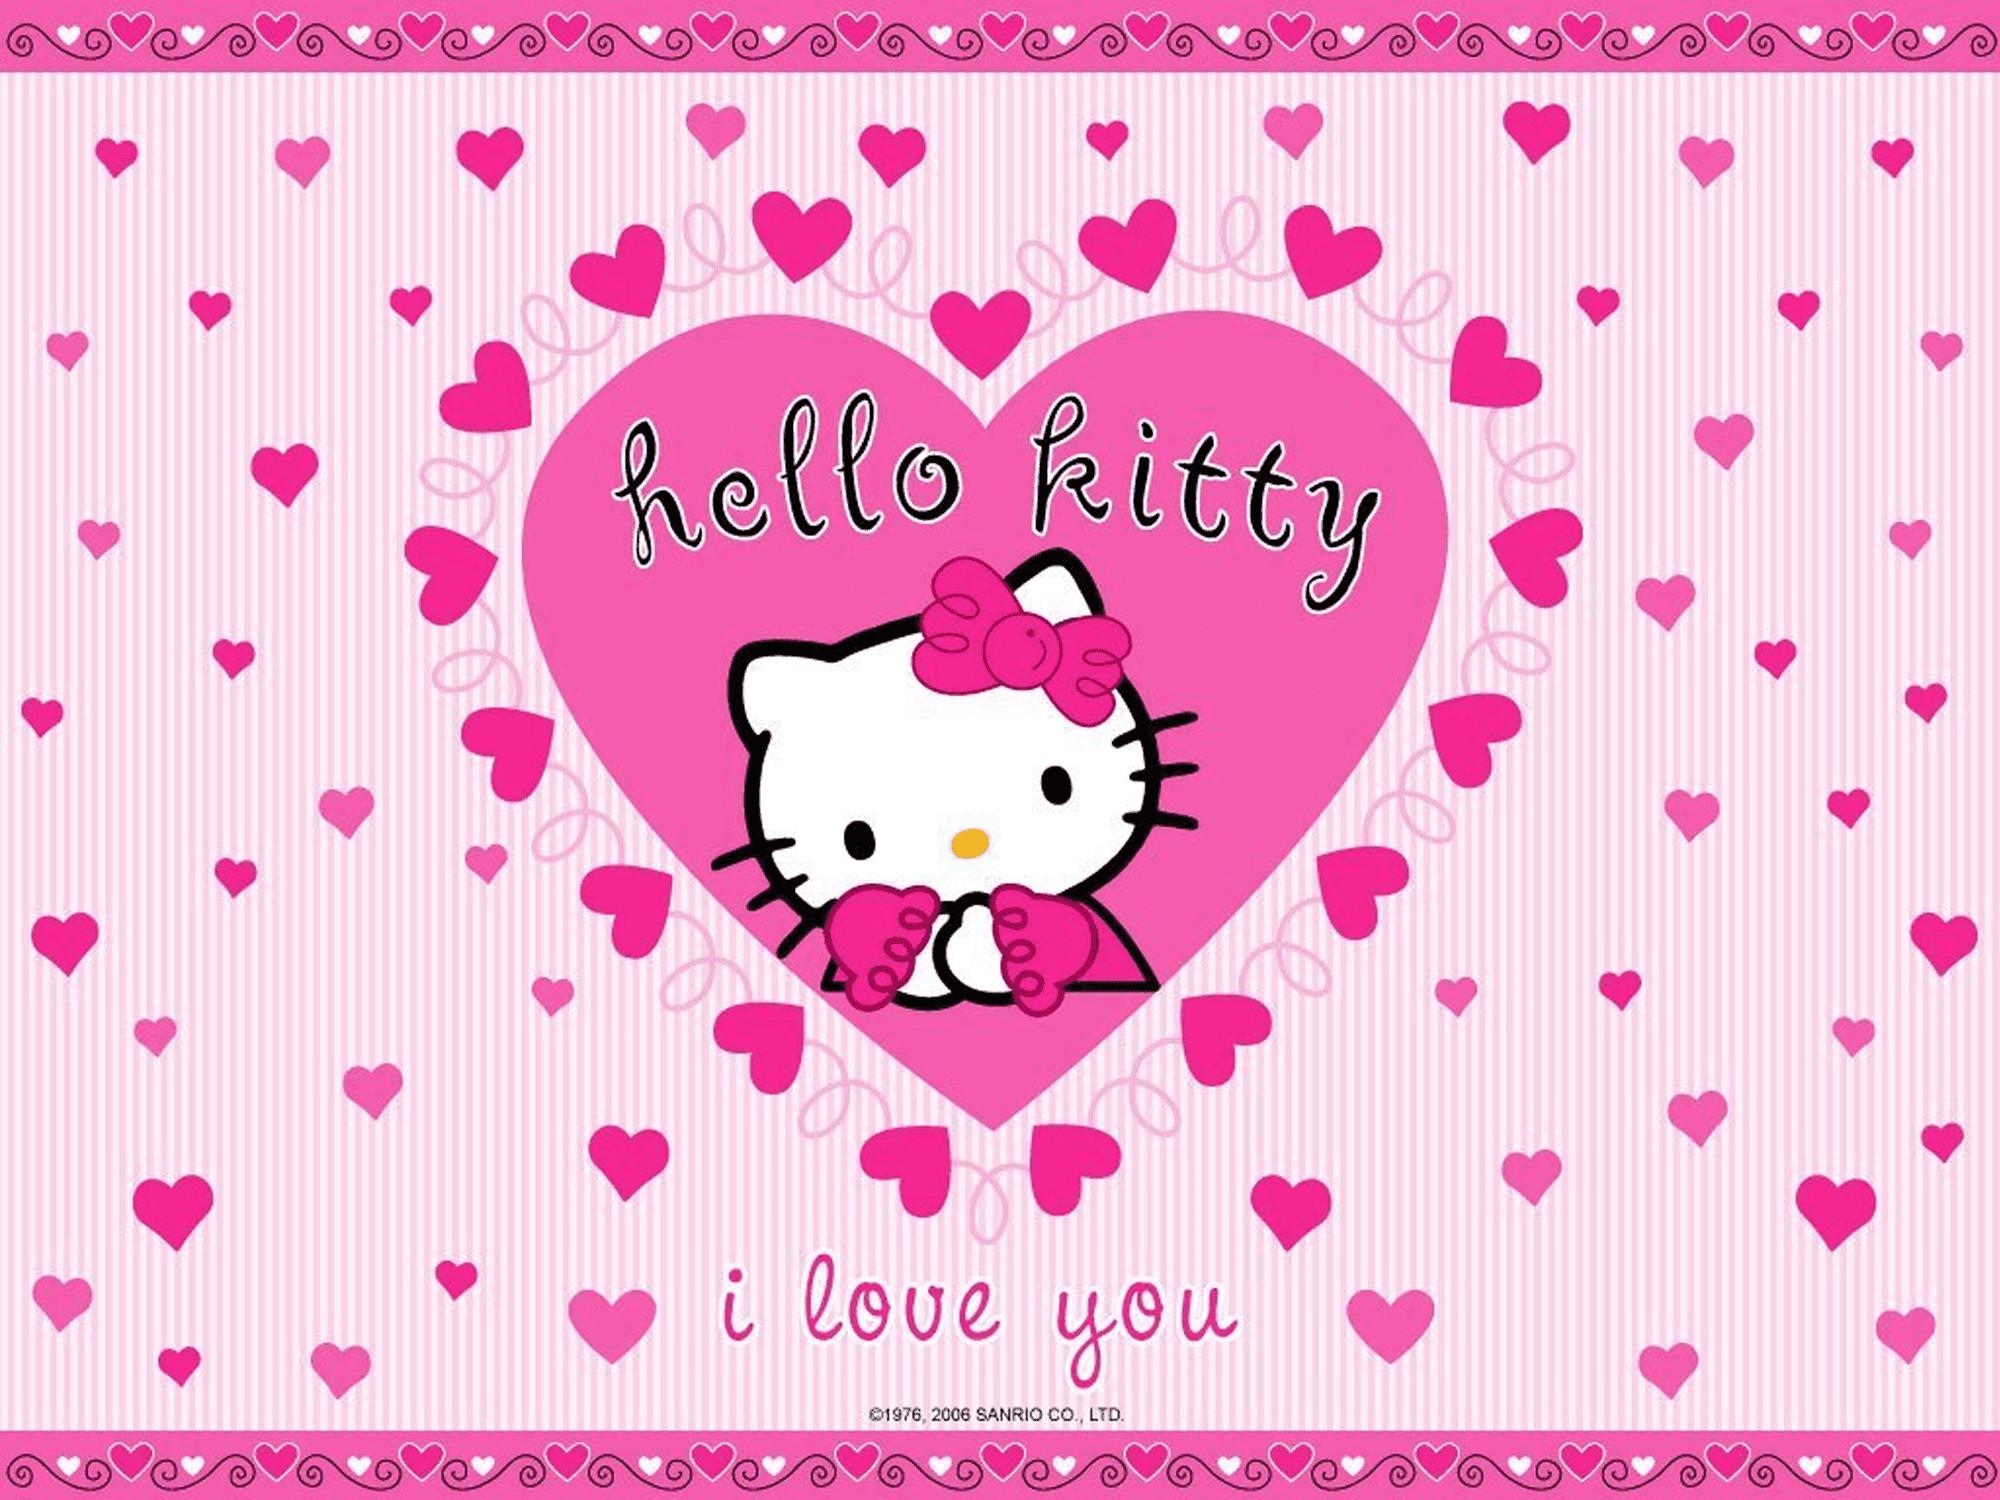 Good Wallpaper Home Screen Hello Kitty - 875762-hello-kitty-valentines-wallpaper-2000x1500-lockscreen  Snapshot_573199.jpg